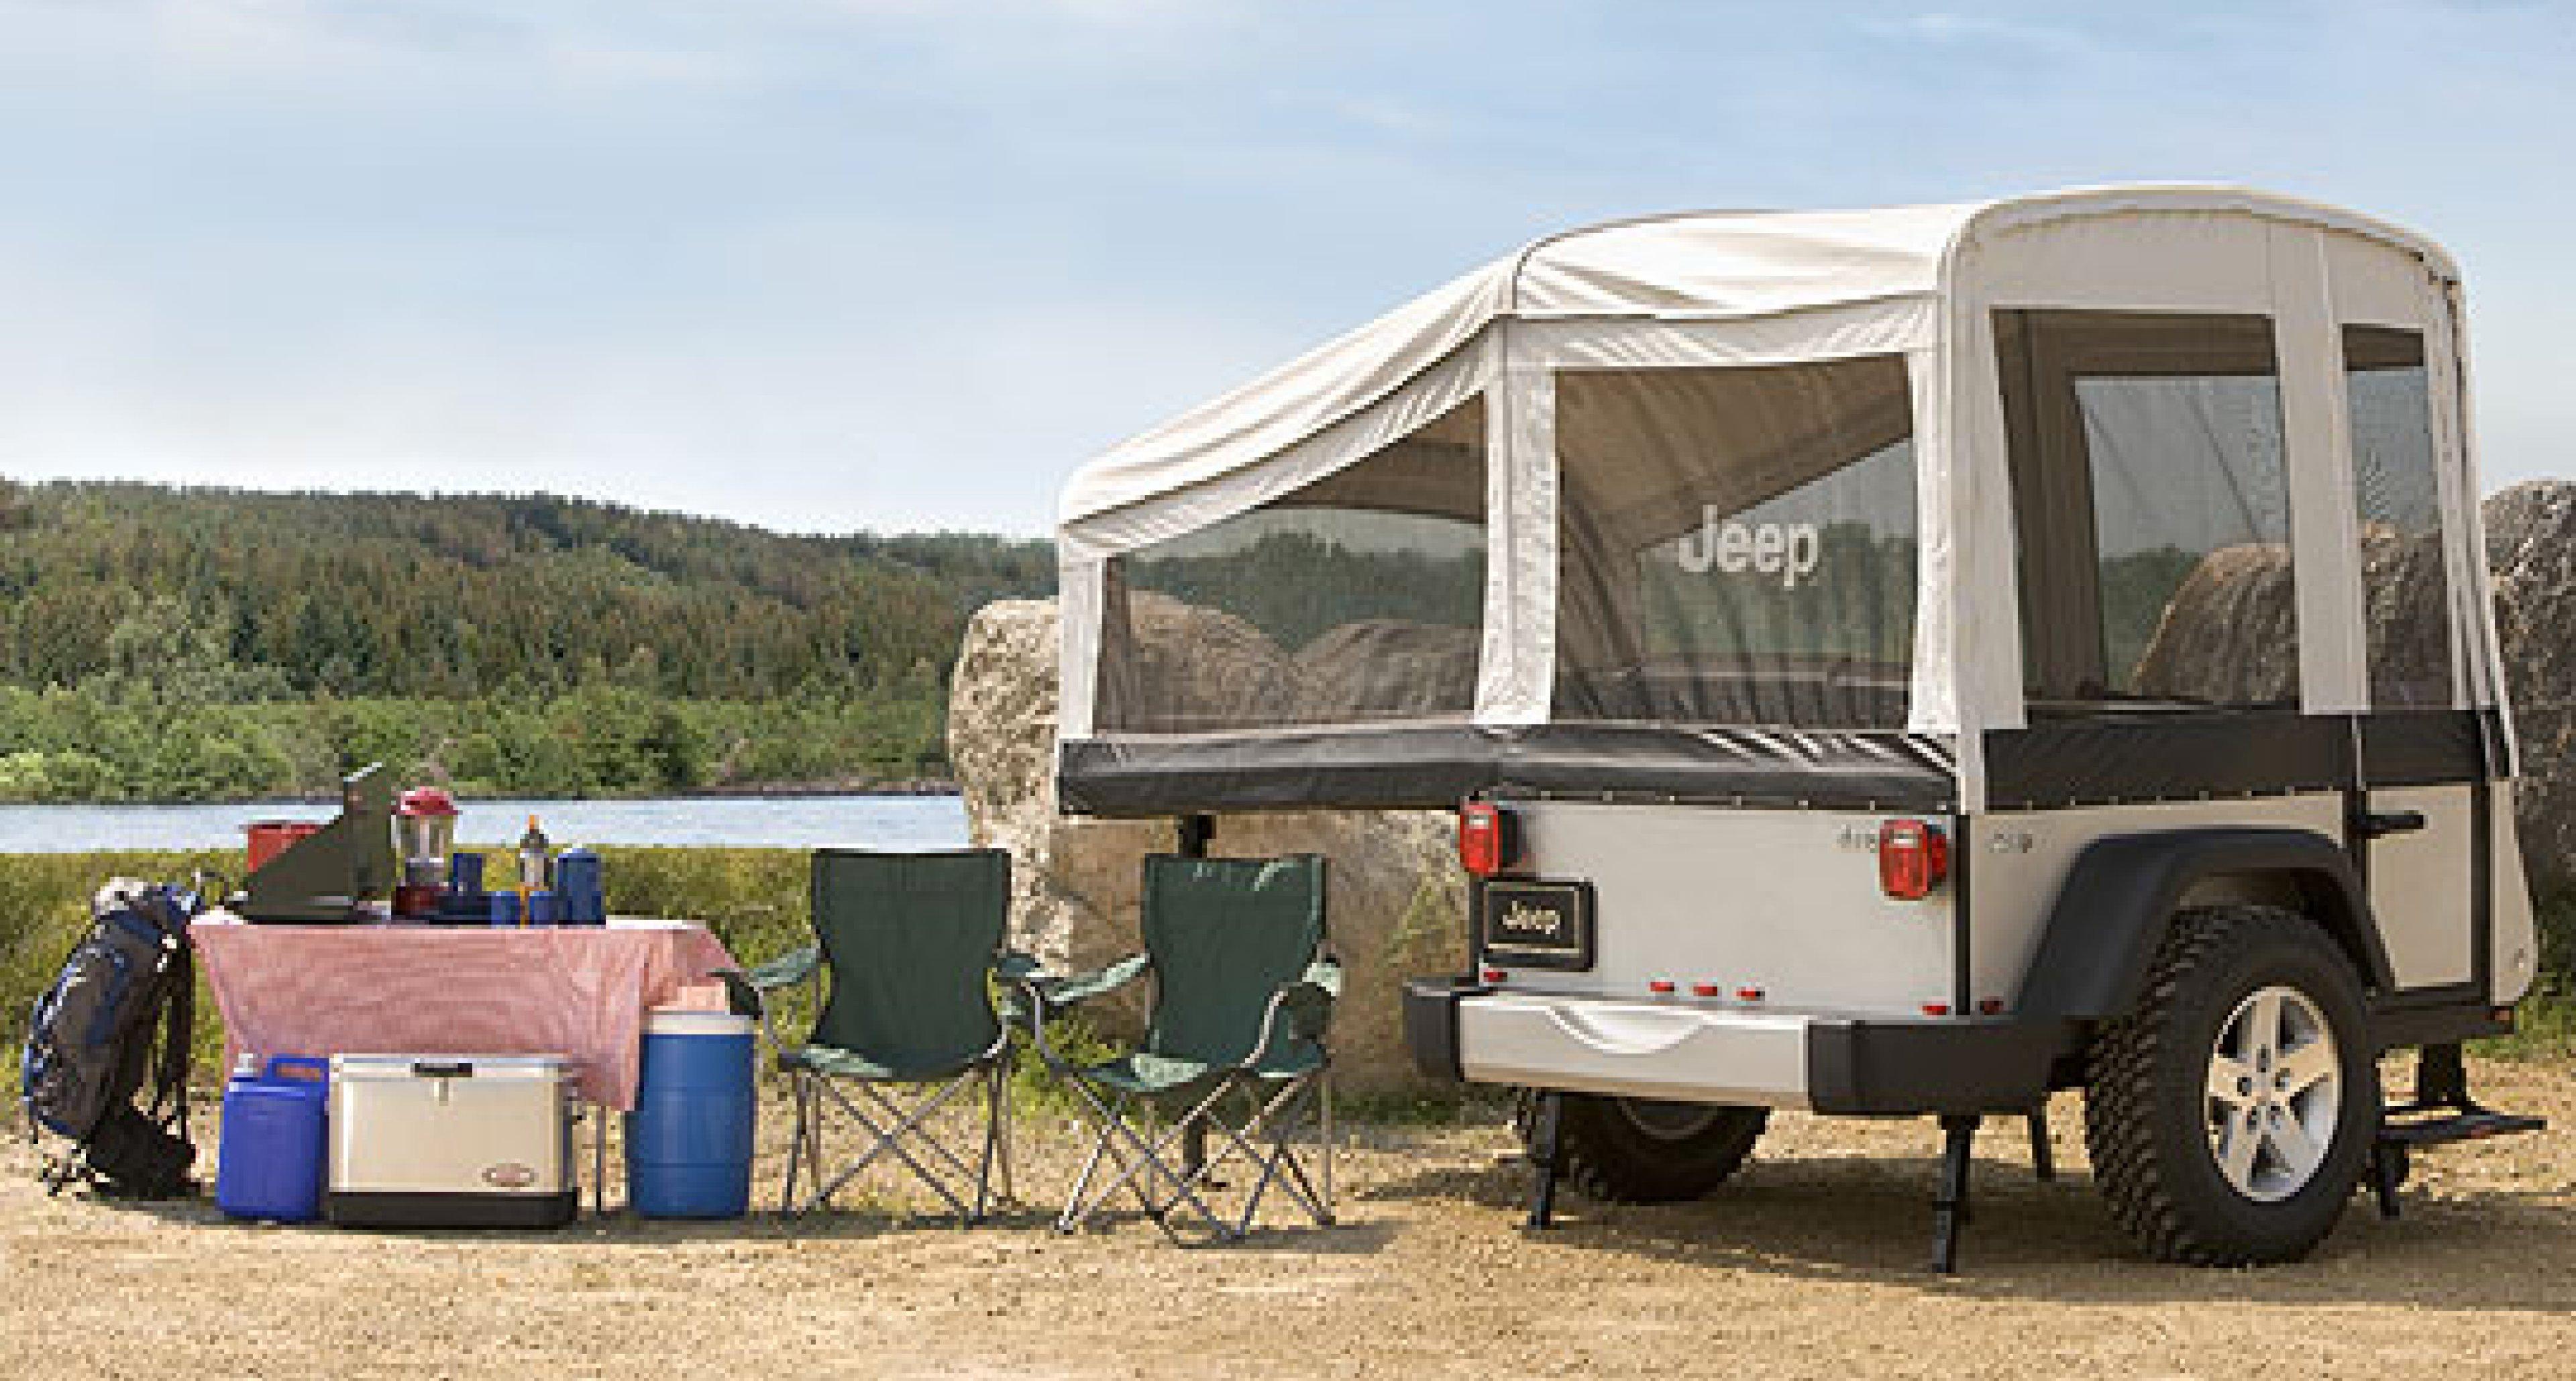 Jeep Camper-Trailer: Wild Campen